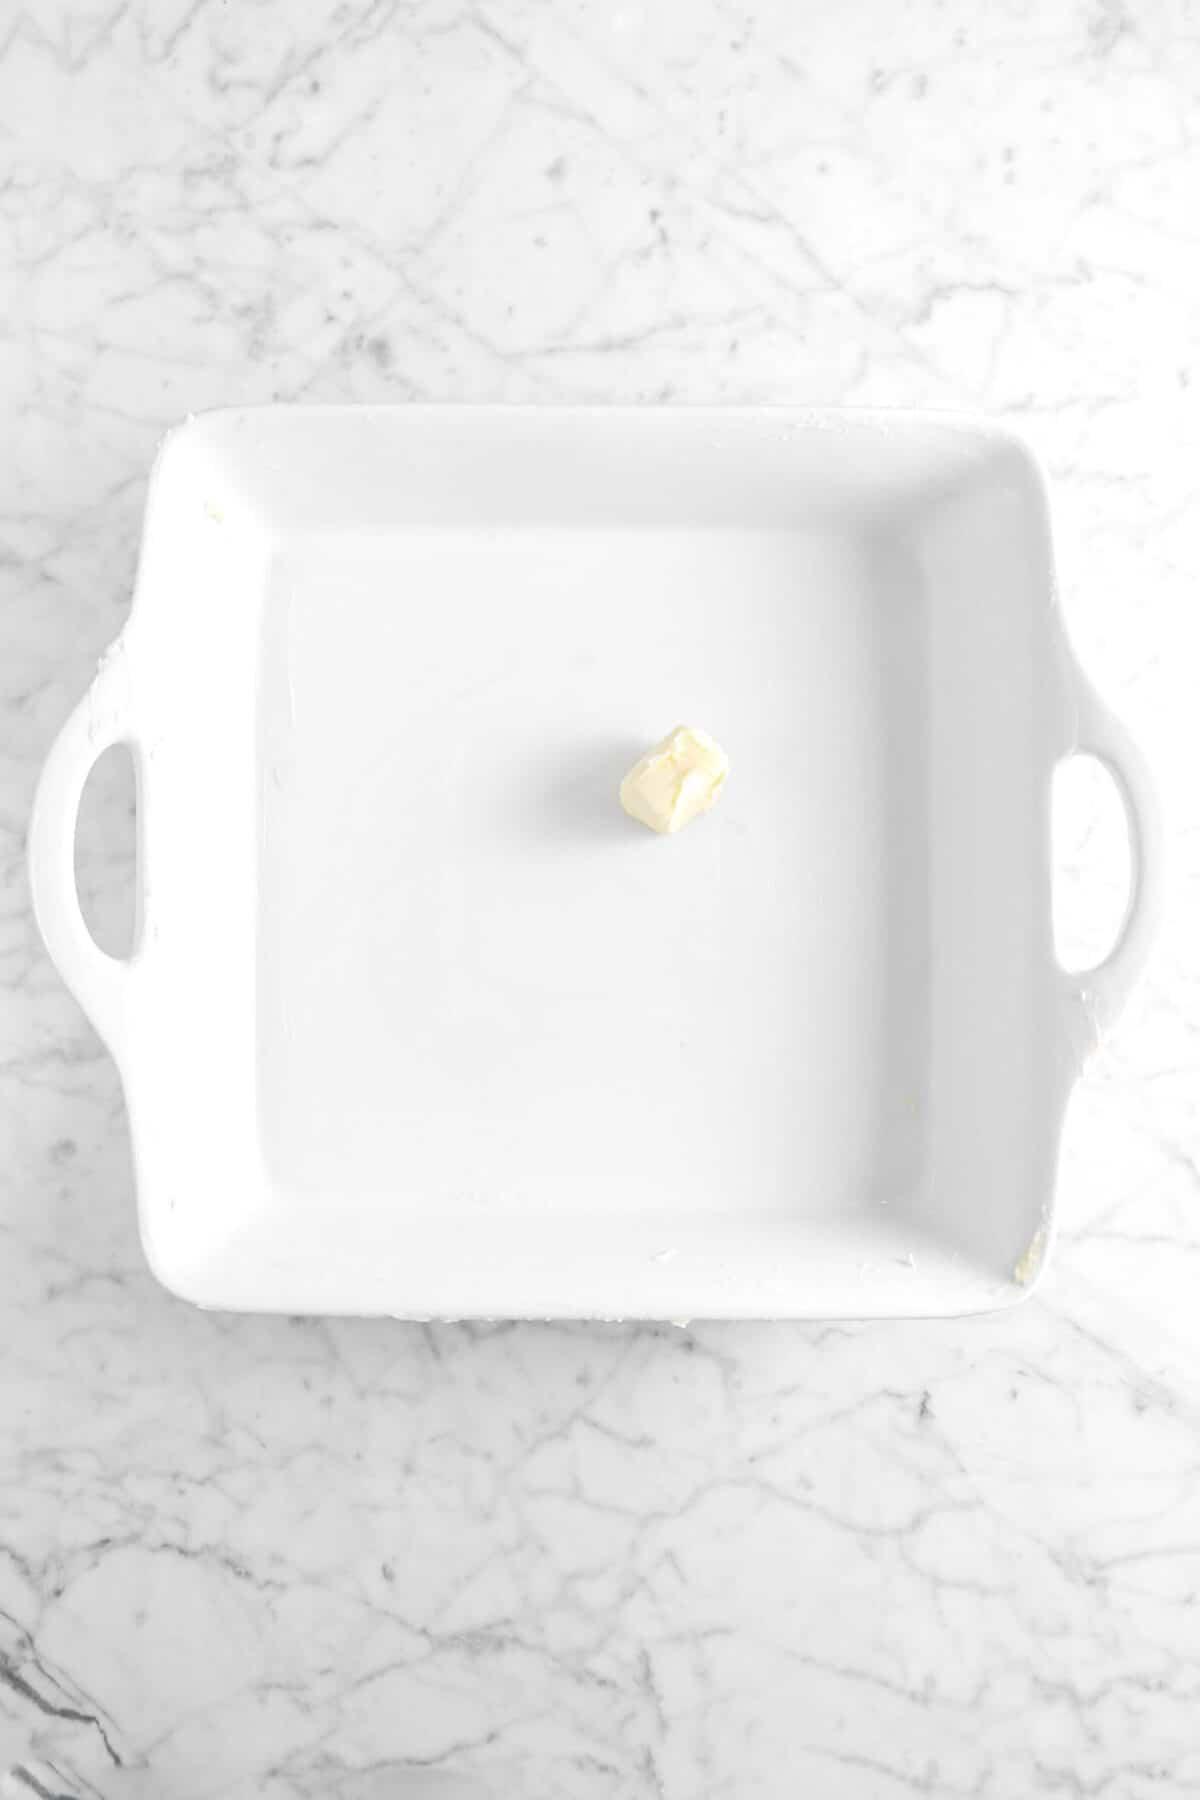 butter in white casserole